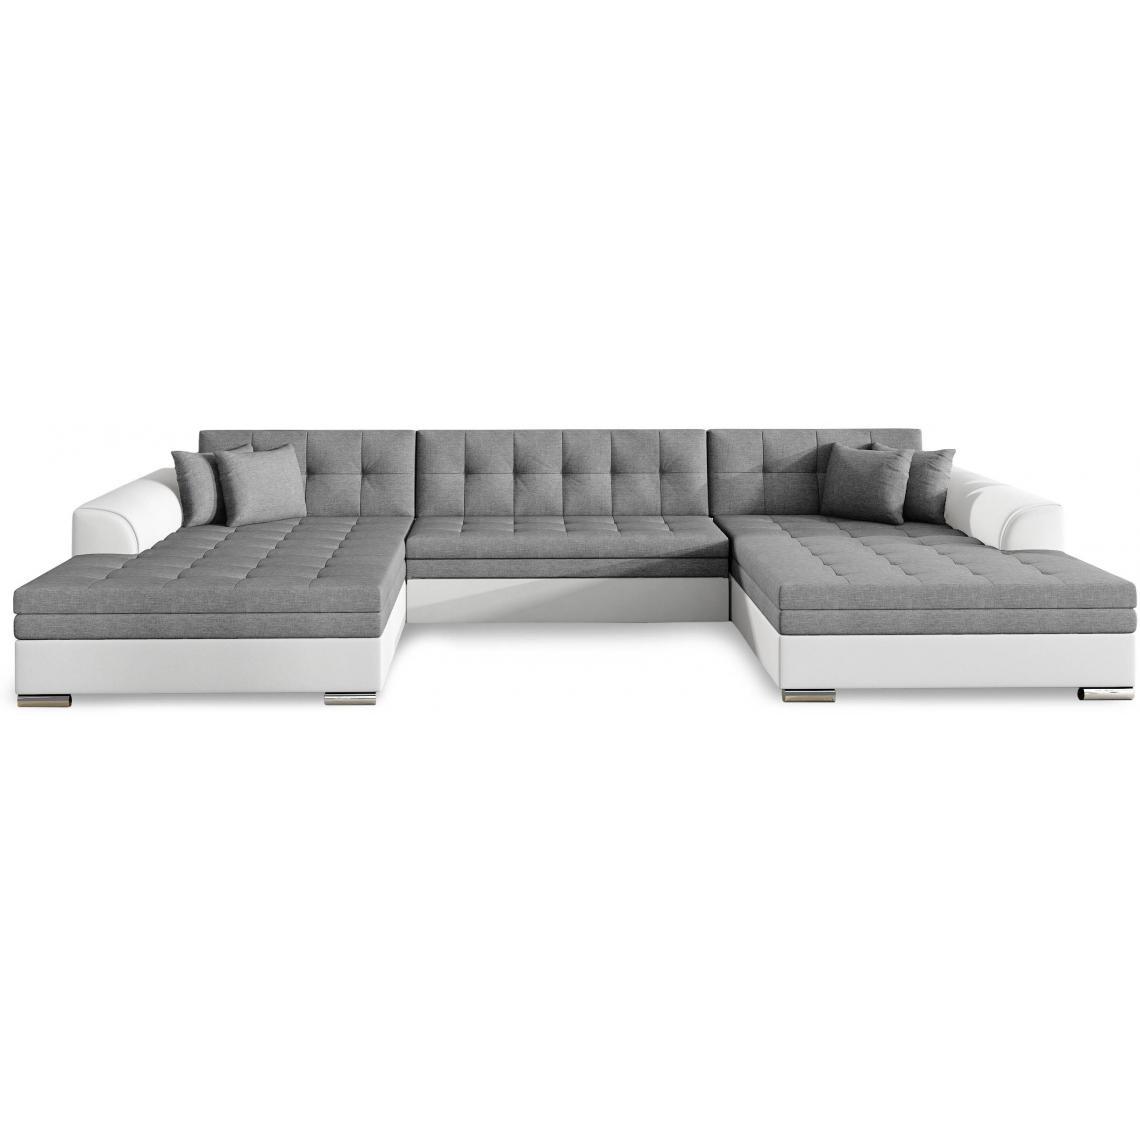 canap d 39 angle u convertible blanc et gris valar 3 suisses. Black Bedroom Furniture Sets. Home Design Ideas